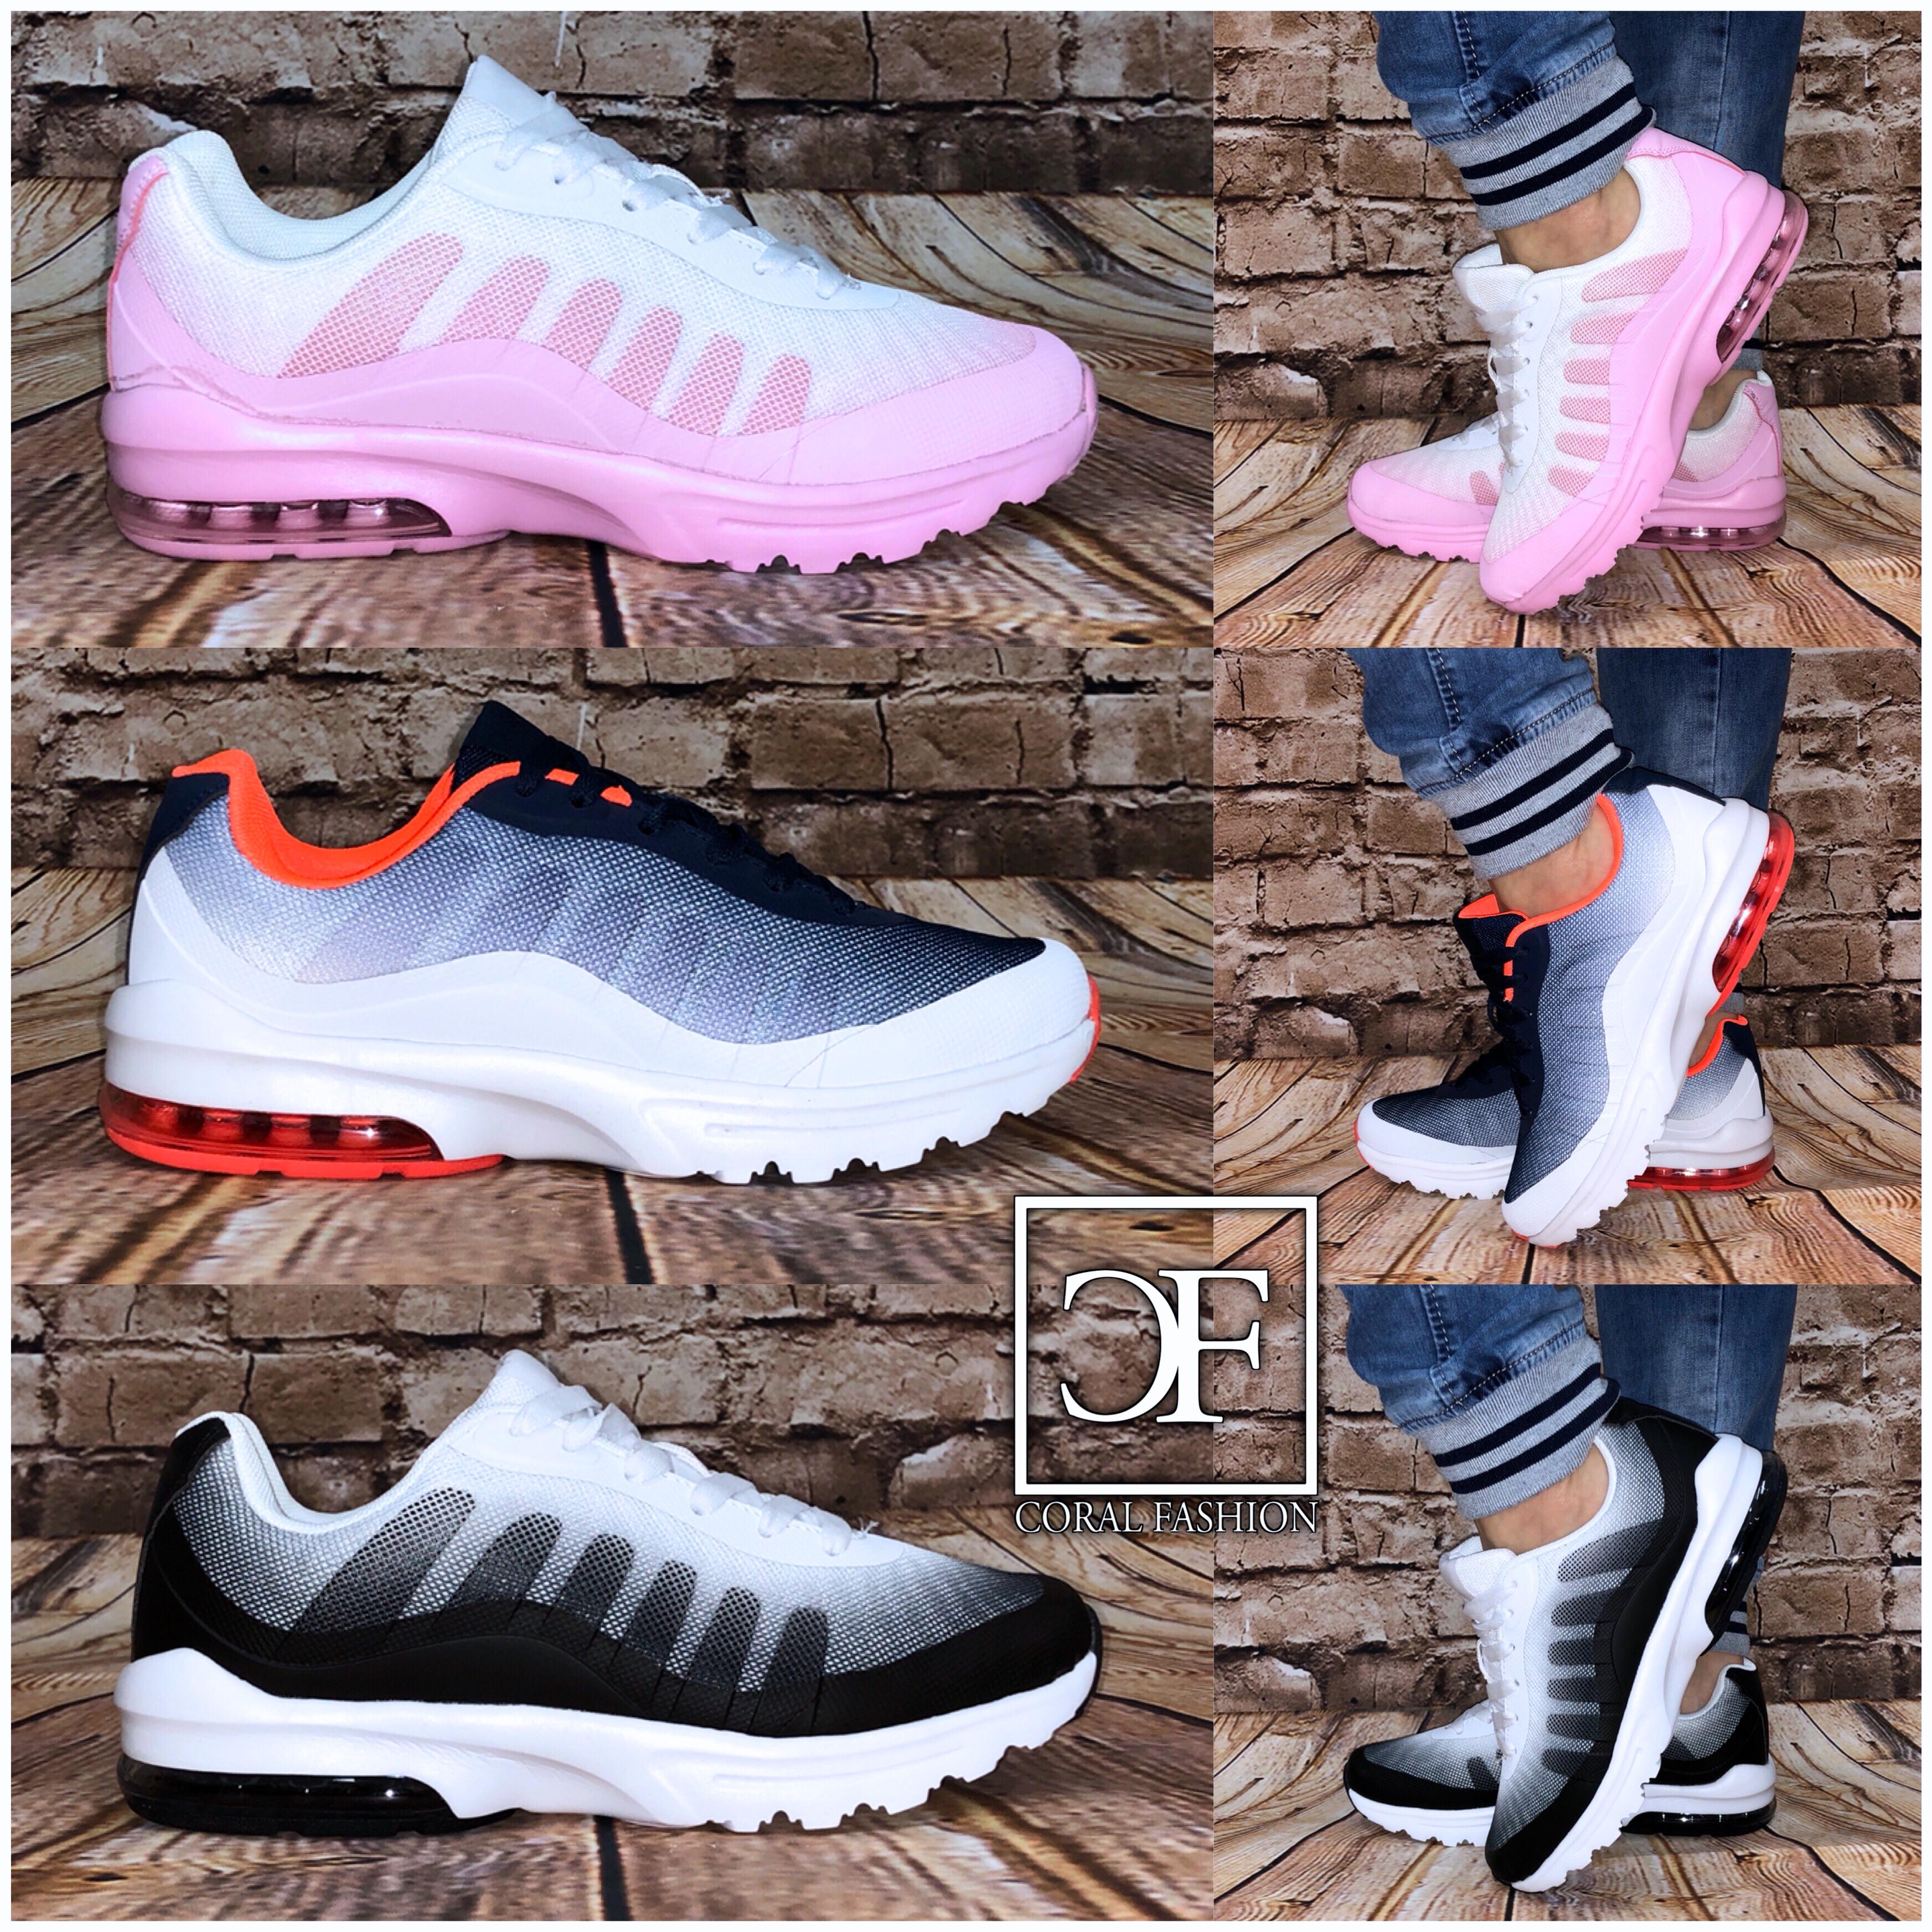 Wow XXL AIR Sportschuhe / Sneakers mit wei?er Sohle